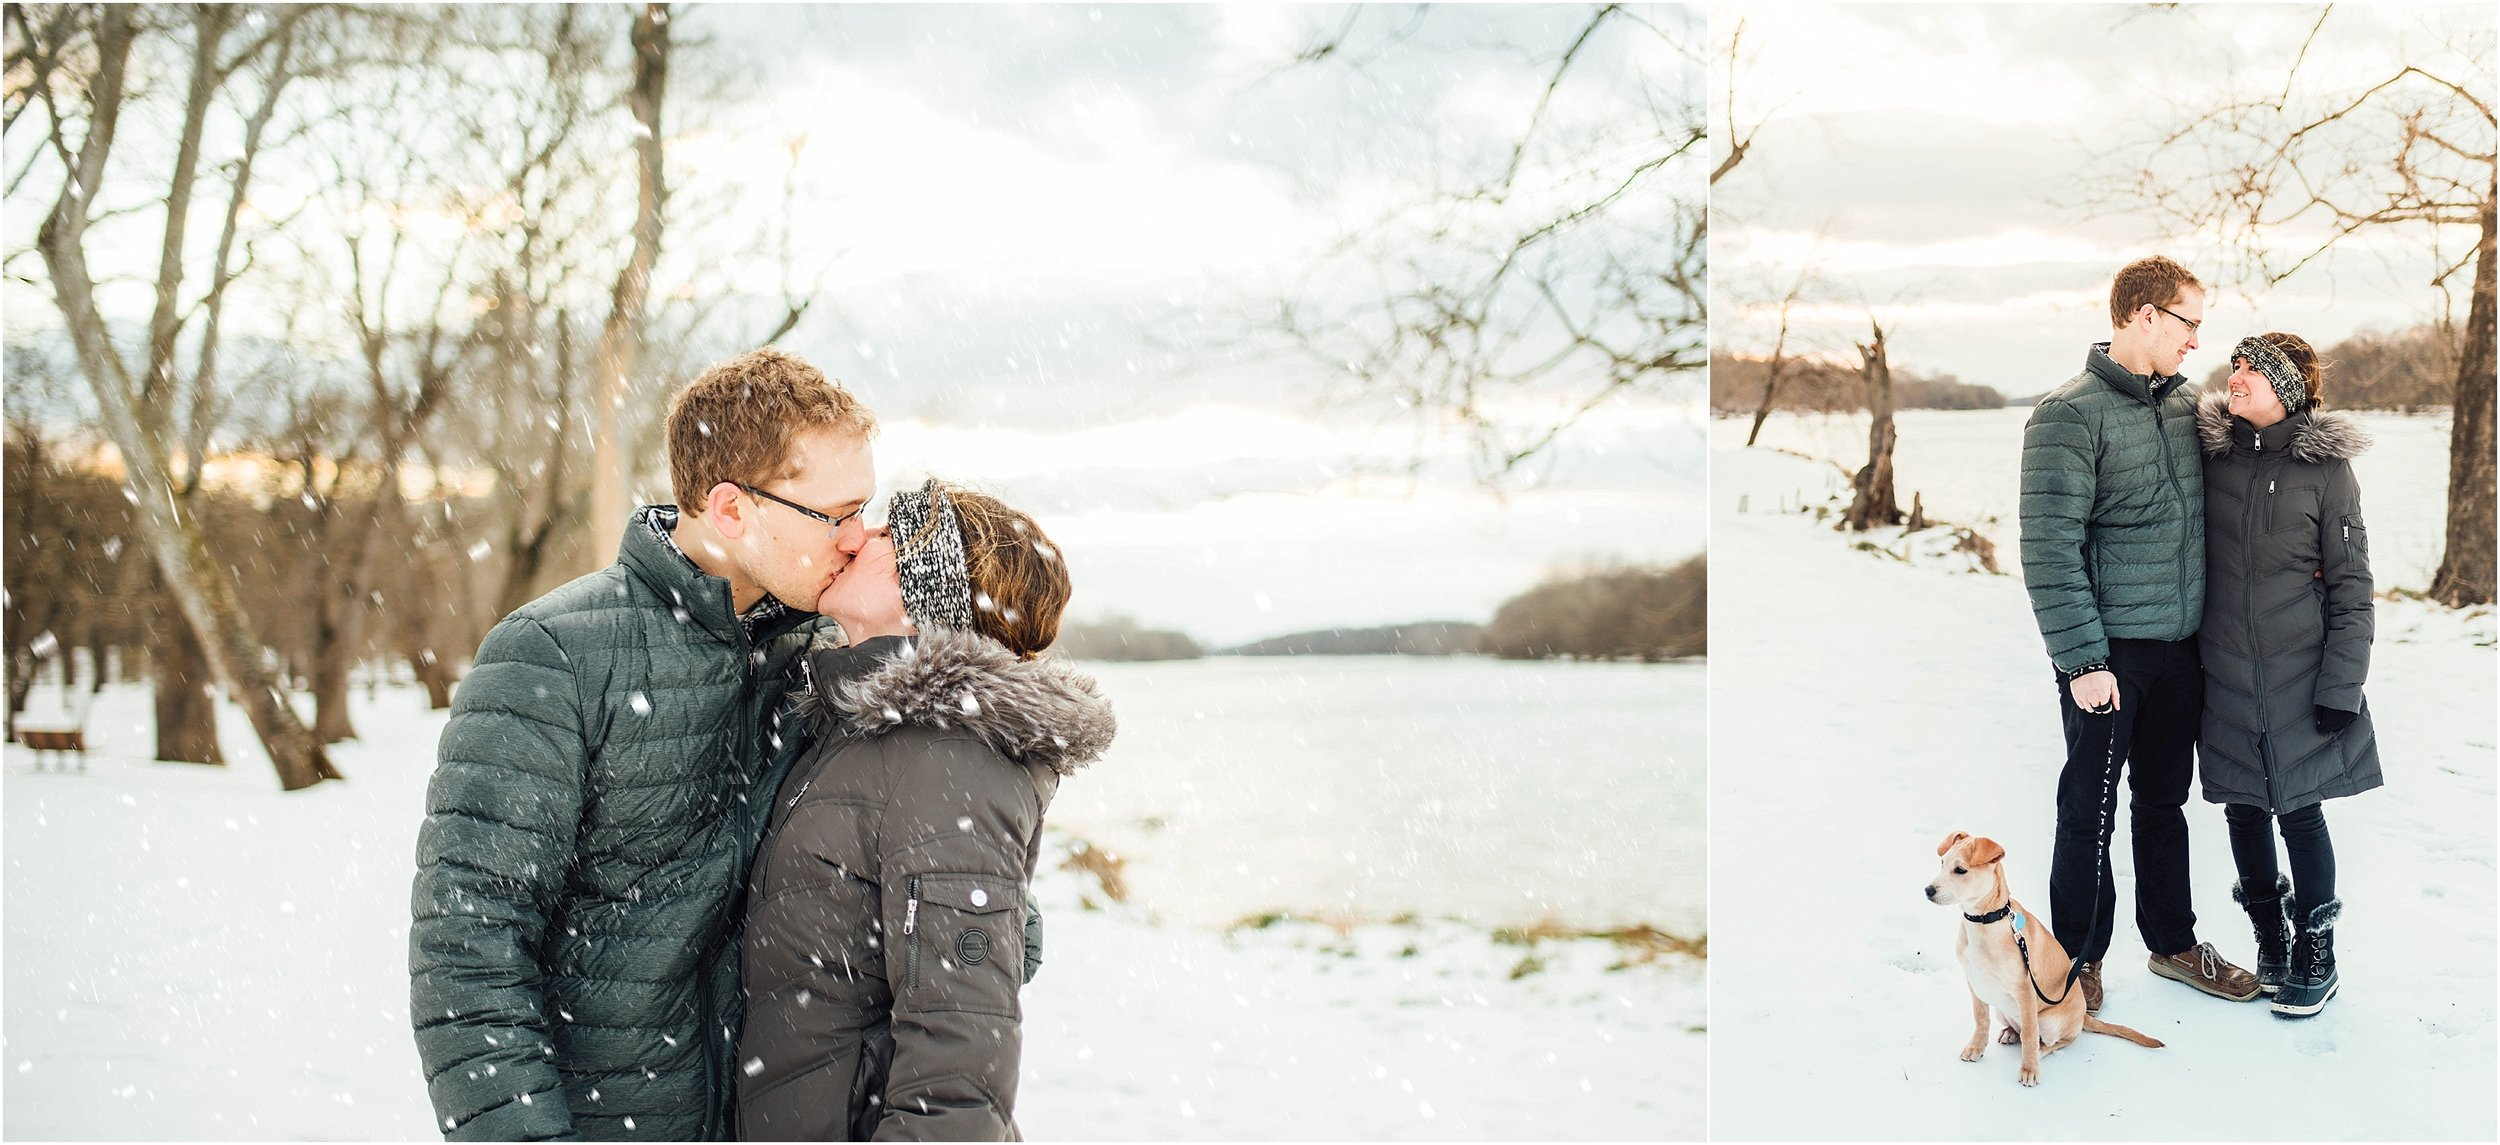 Snow Engagement Session at Algonkian Regional Park